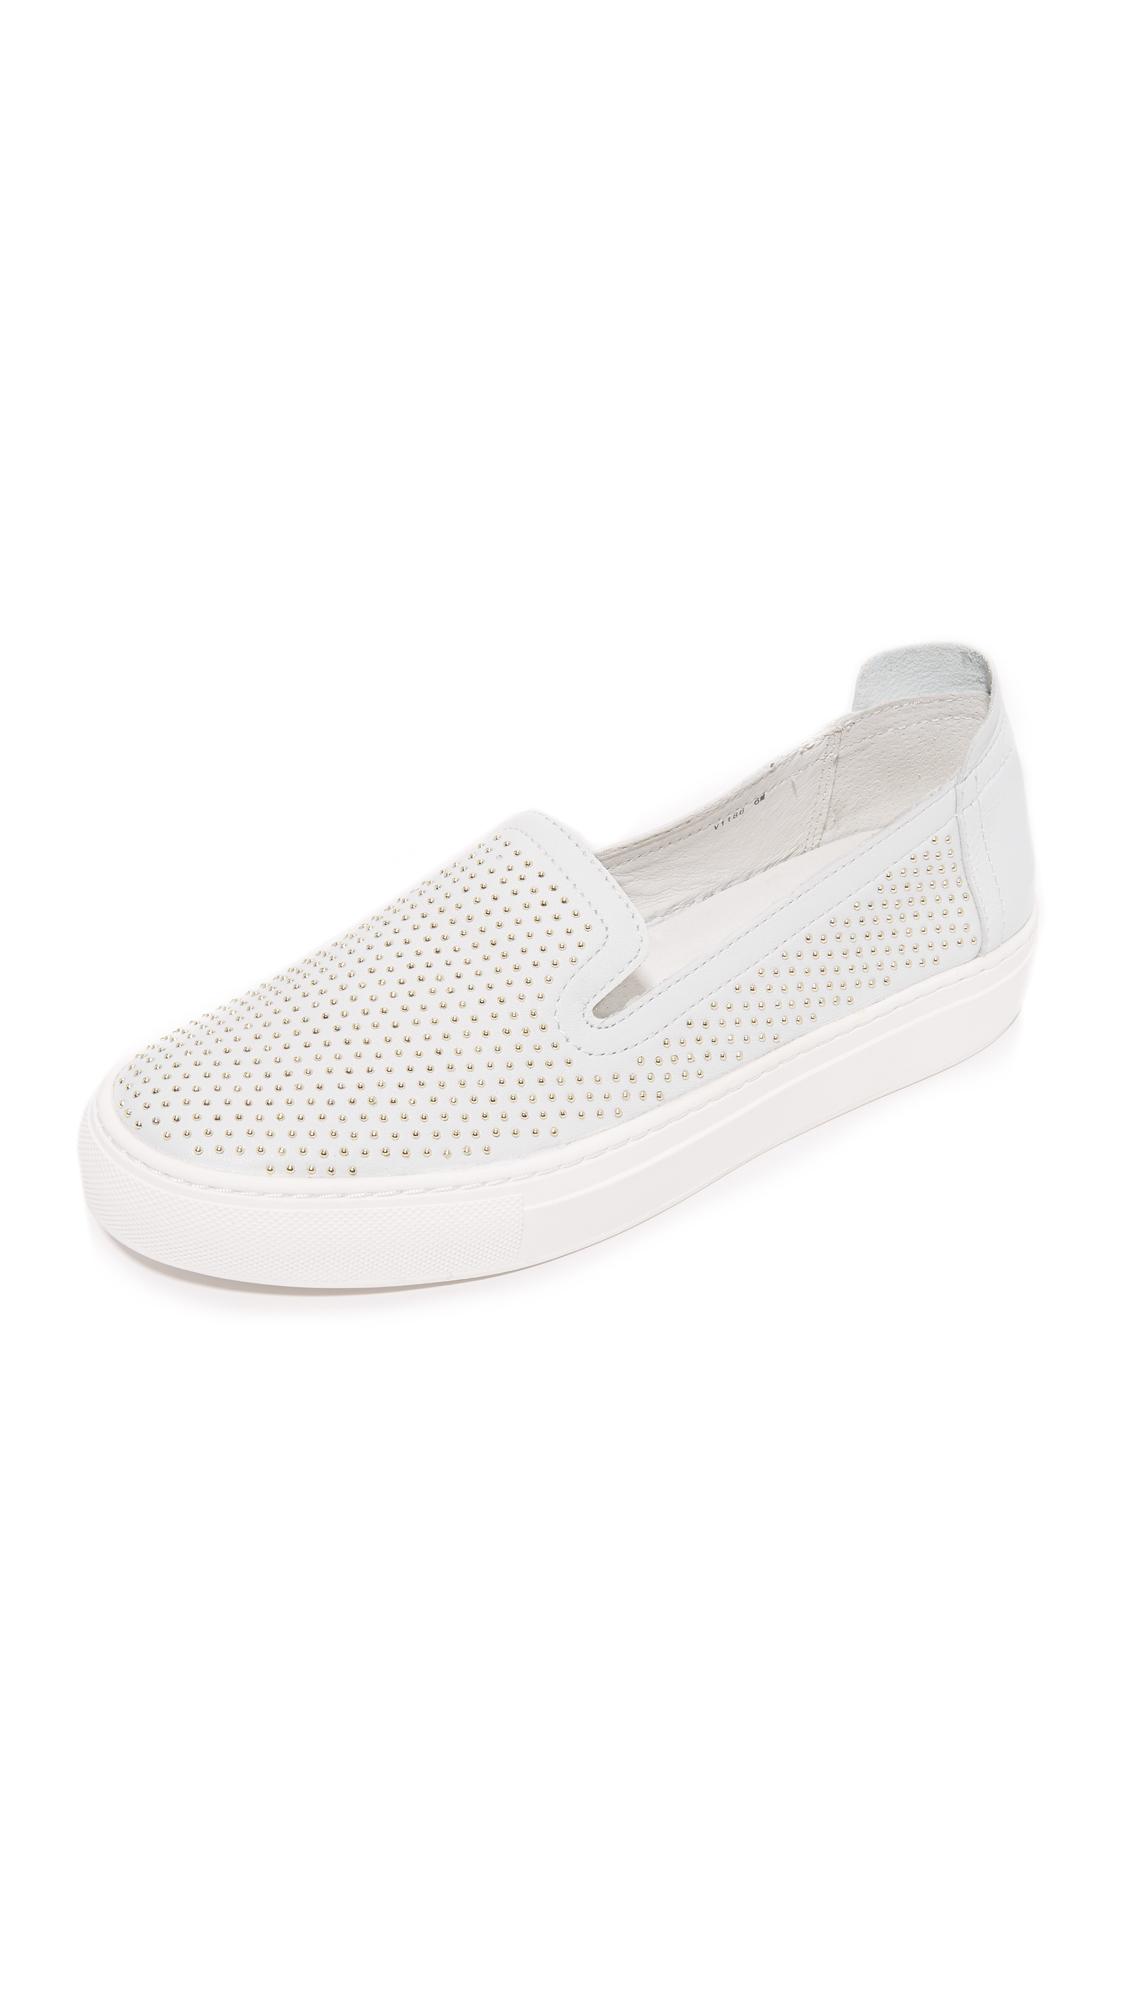 rachel zoe female rachel zoe burke studded slip on sneakers white